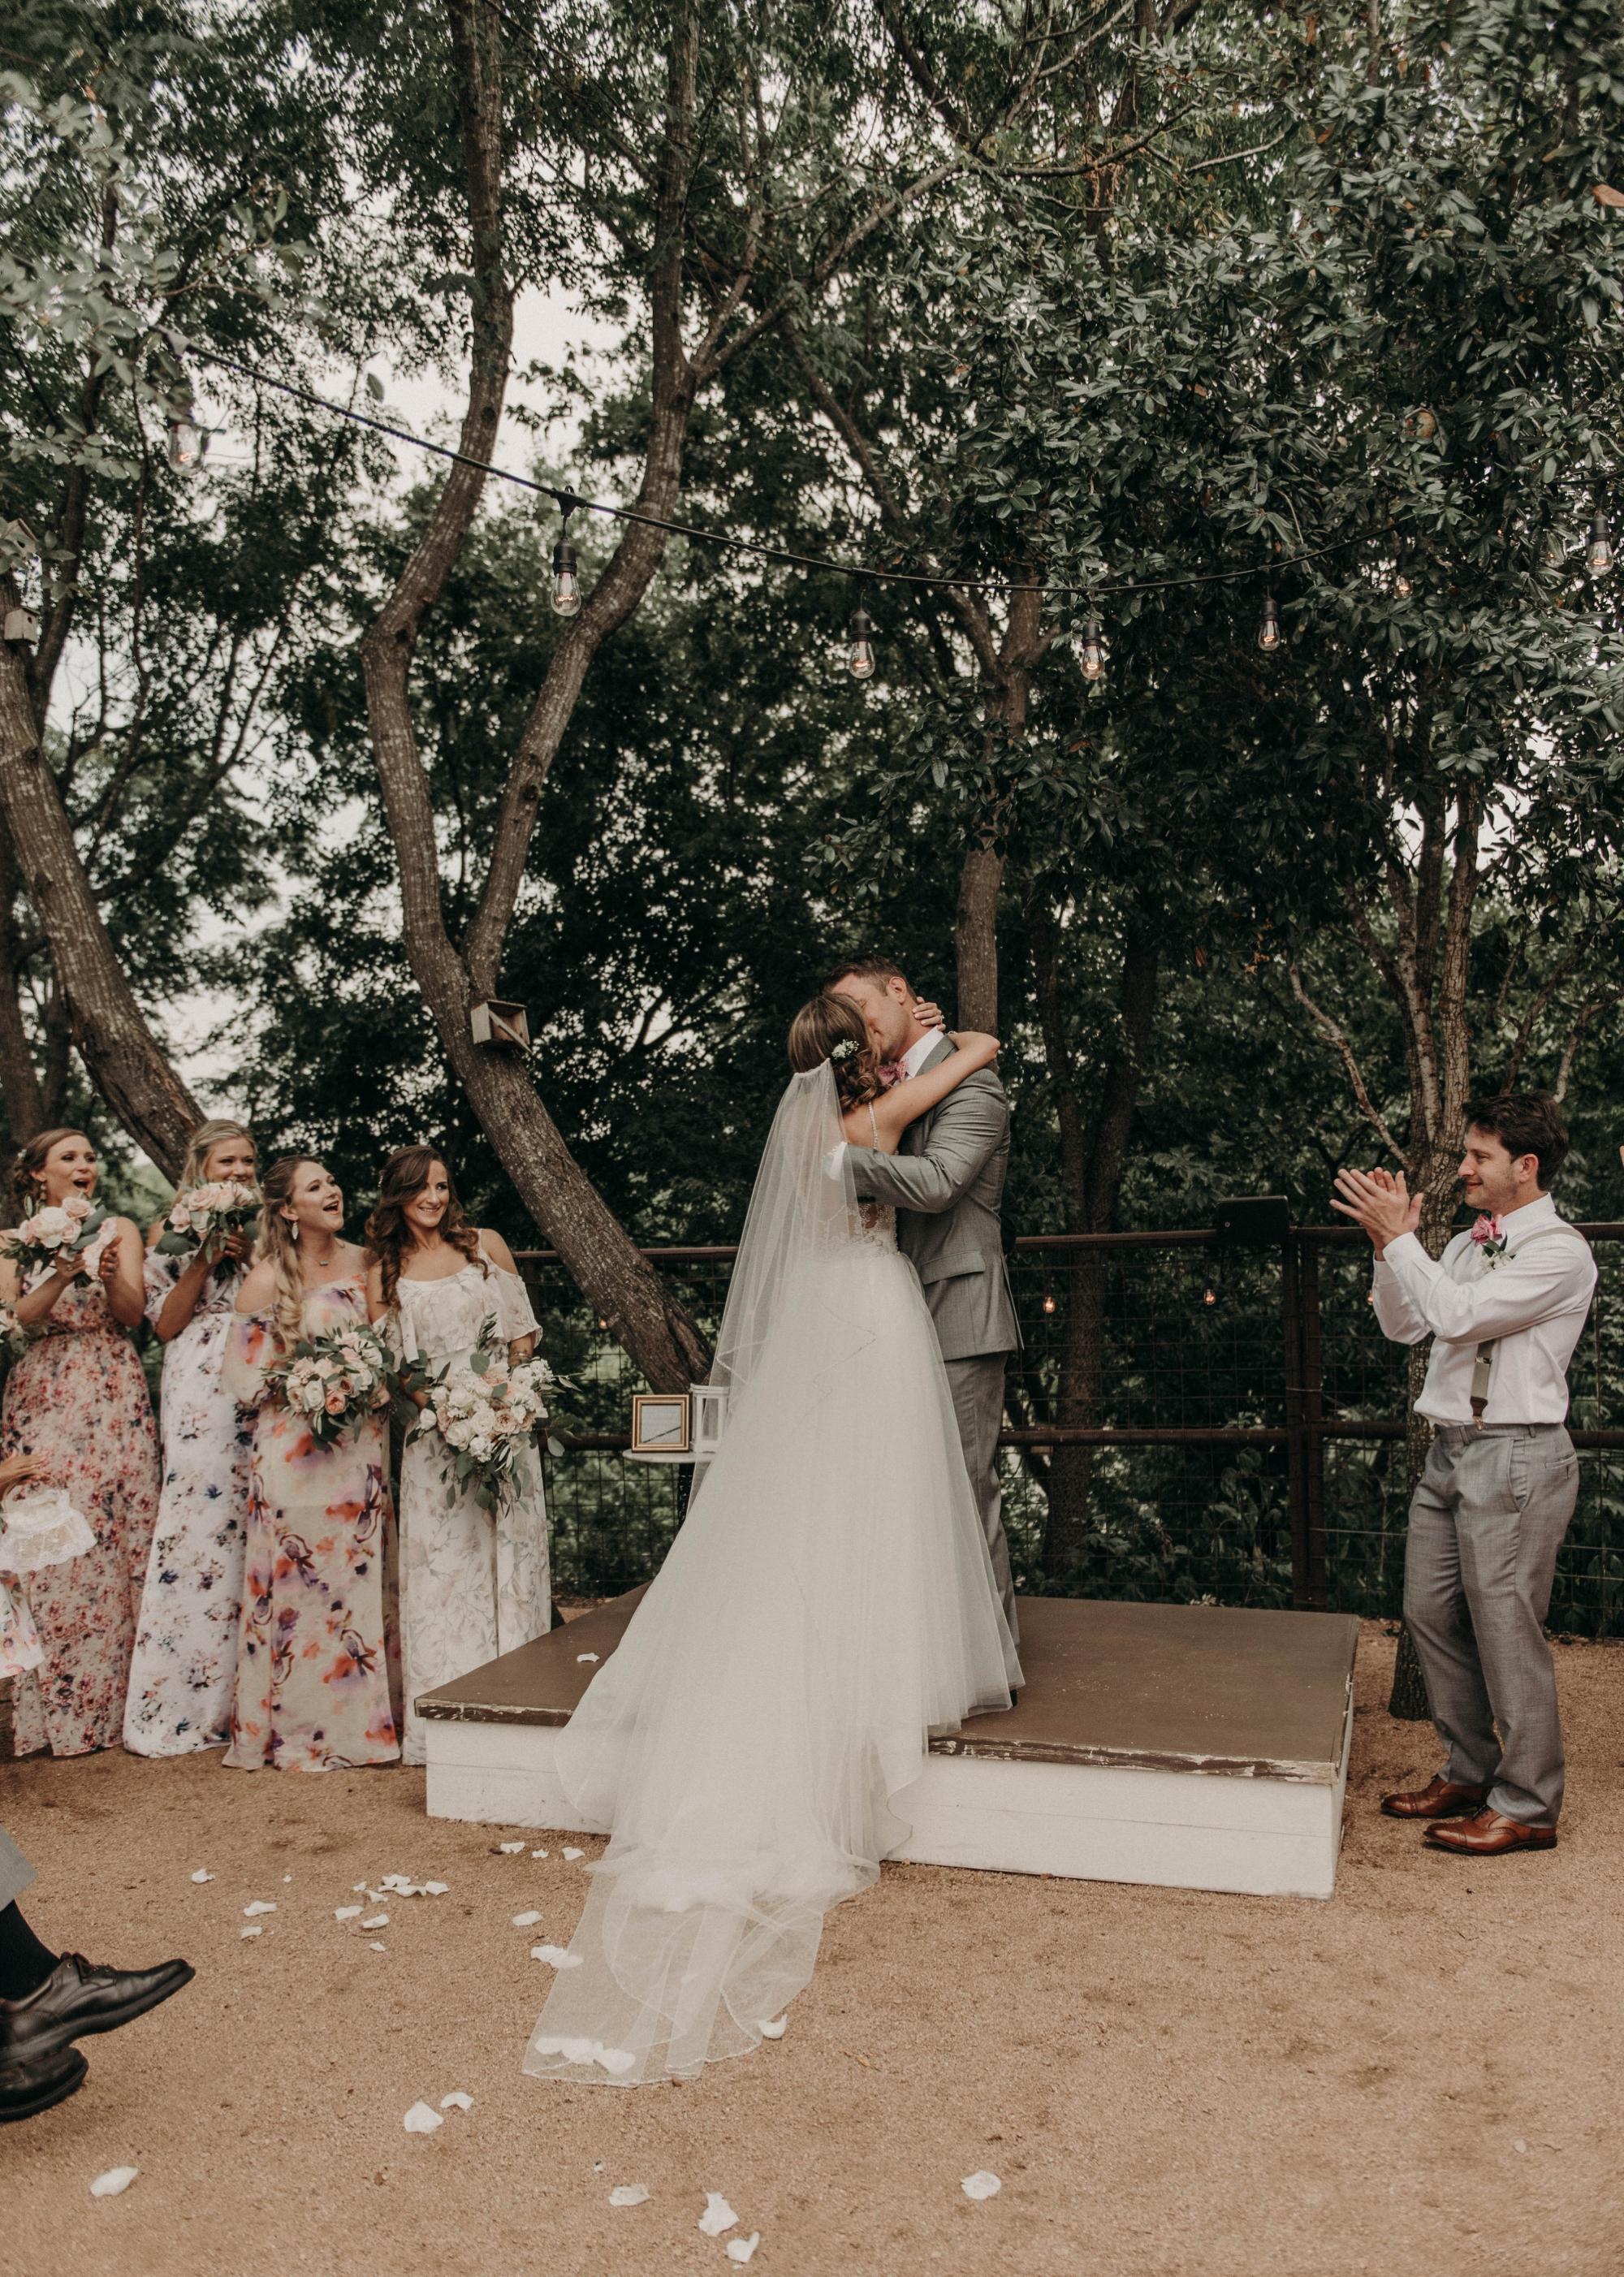 austin-texas-wedding-photography-1778-photographie-15.jpg